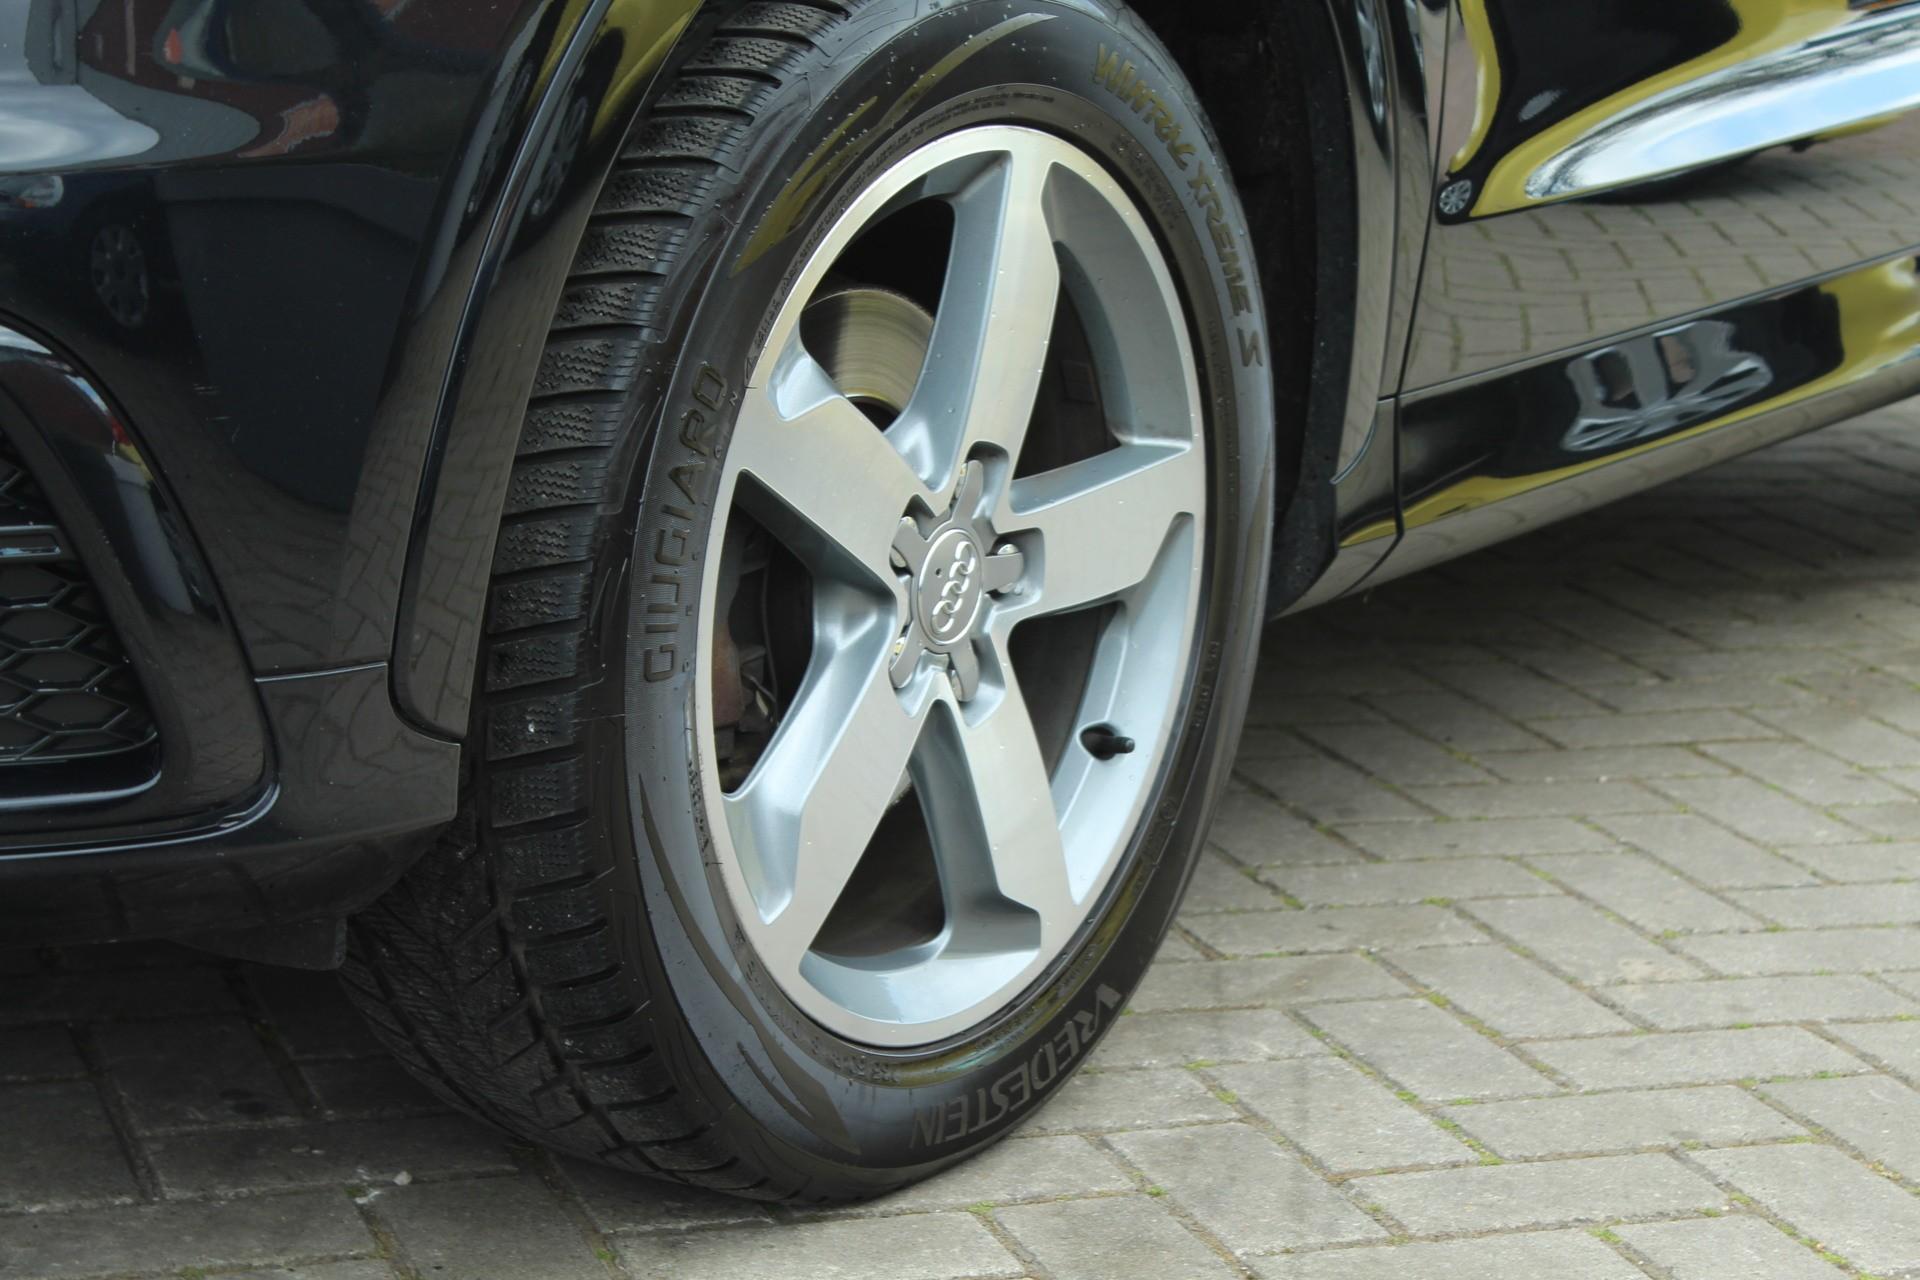 Caroutlet Groningen - Audi Q3 2.0 TDI quattro   2X S-LINE   PANODAK   LED/XENON  